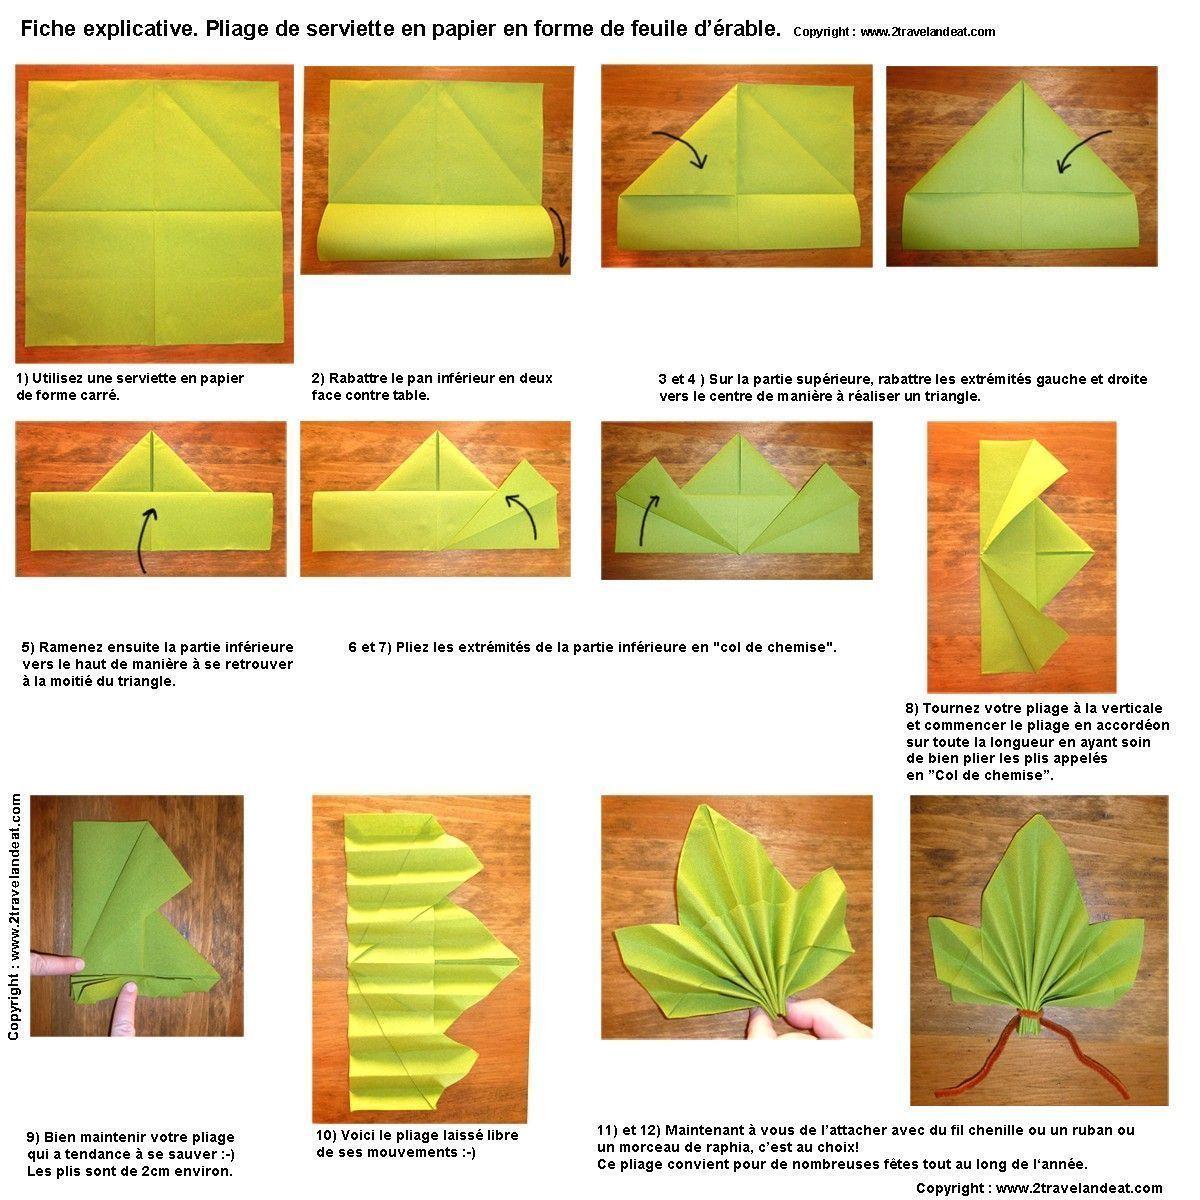 Pliage De Serviette En Papier 2 Couleurs Feuille Fashion Designs Avec Pliage Serviette Feuille D E In 2020 Beautiful Napkin Folding Napkin Folding Paper Crafts Origami